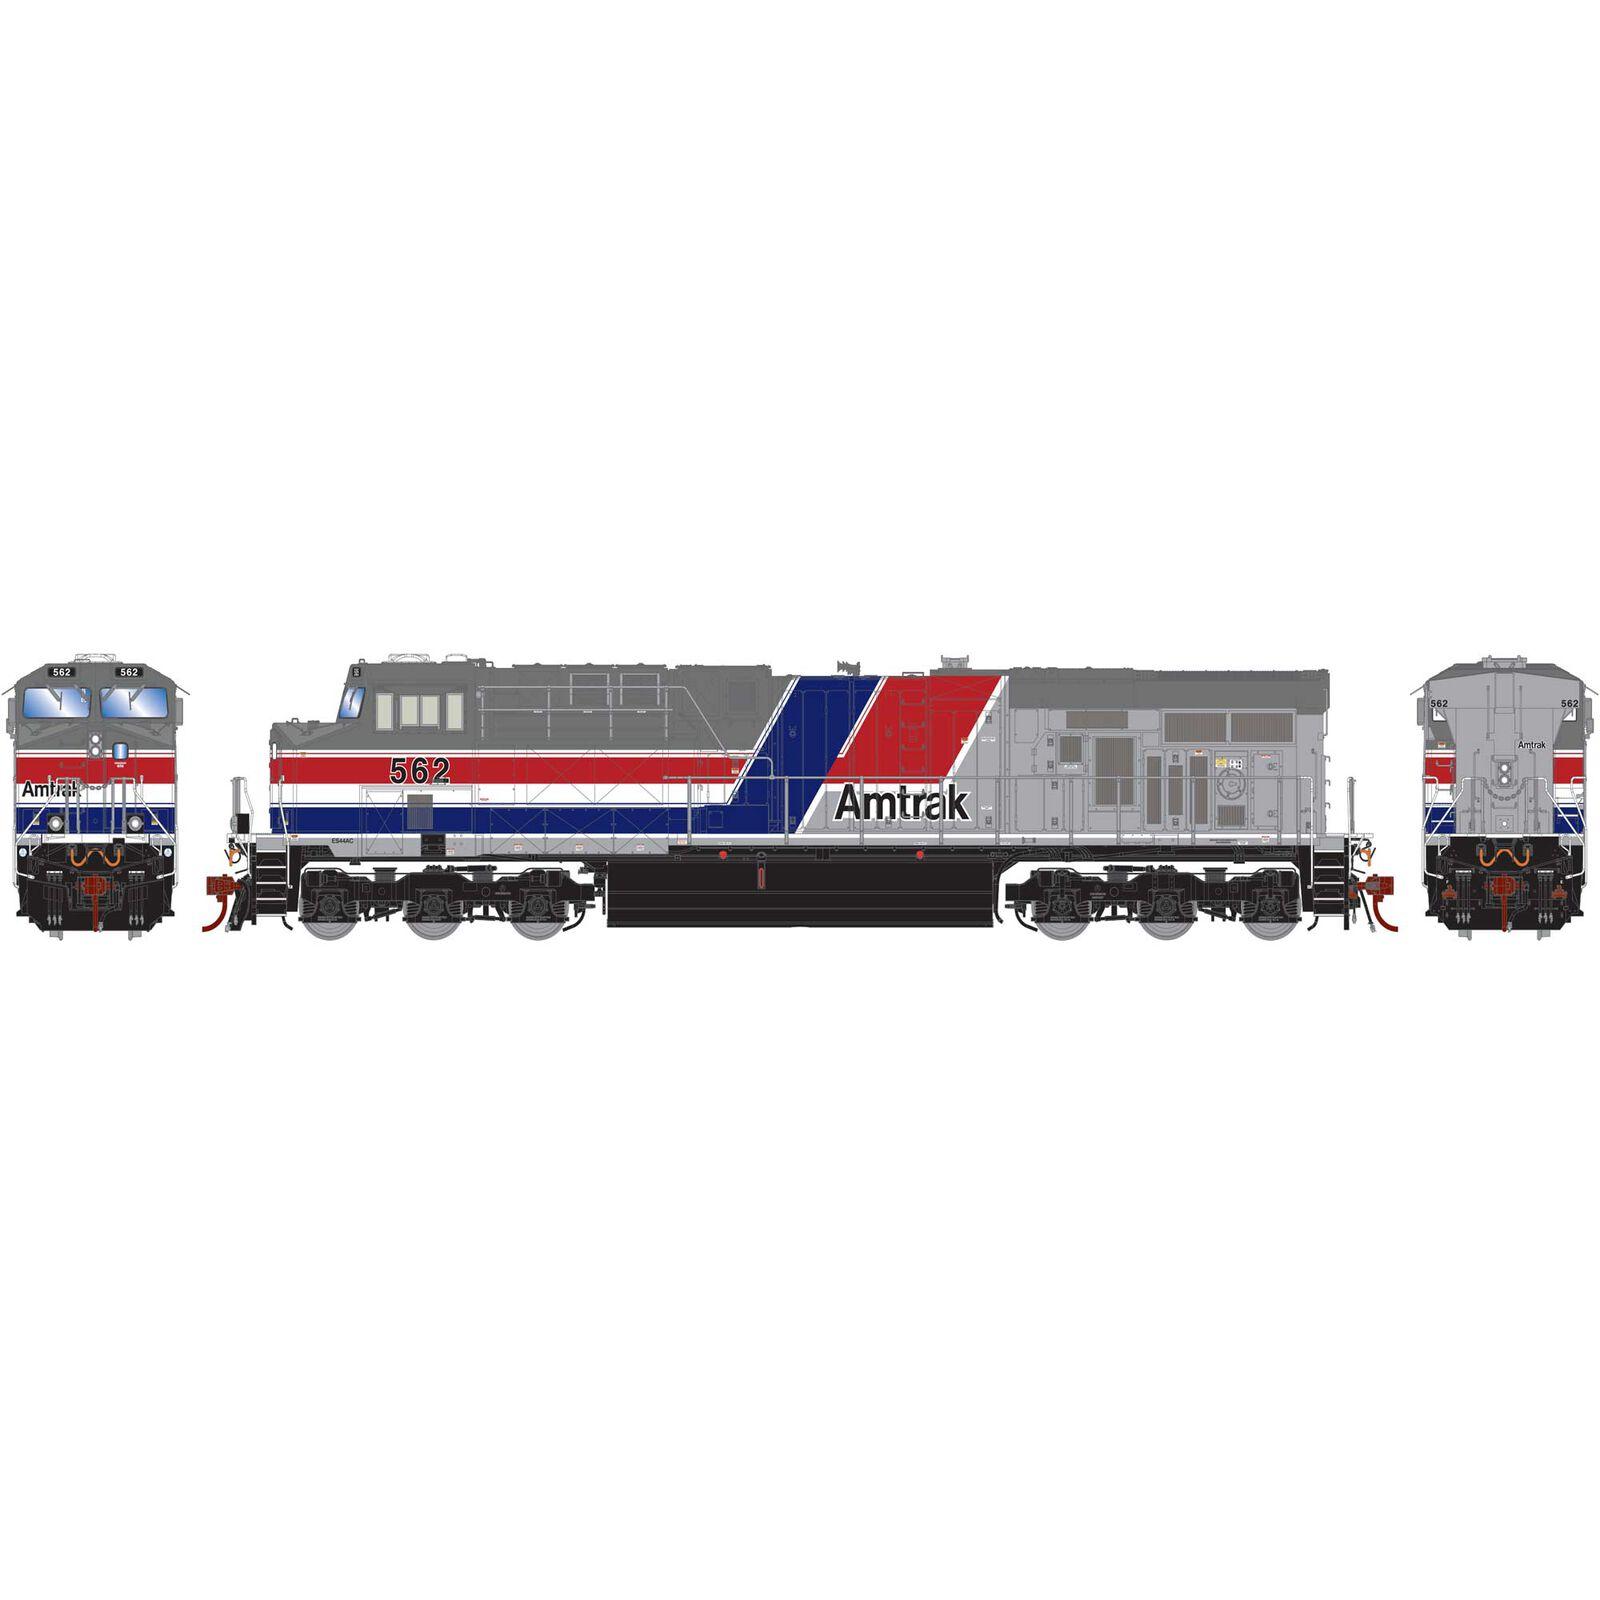 HO ES44AC with DCC & Sound Amtrak #562